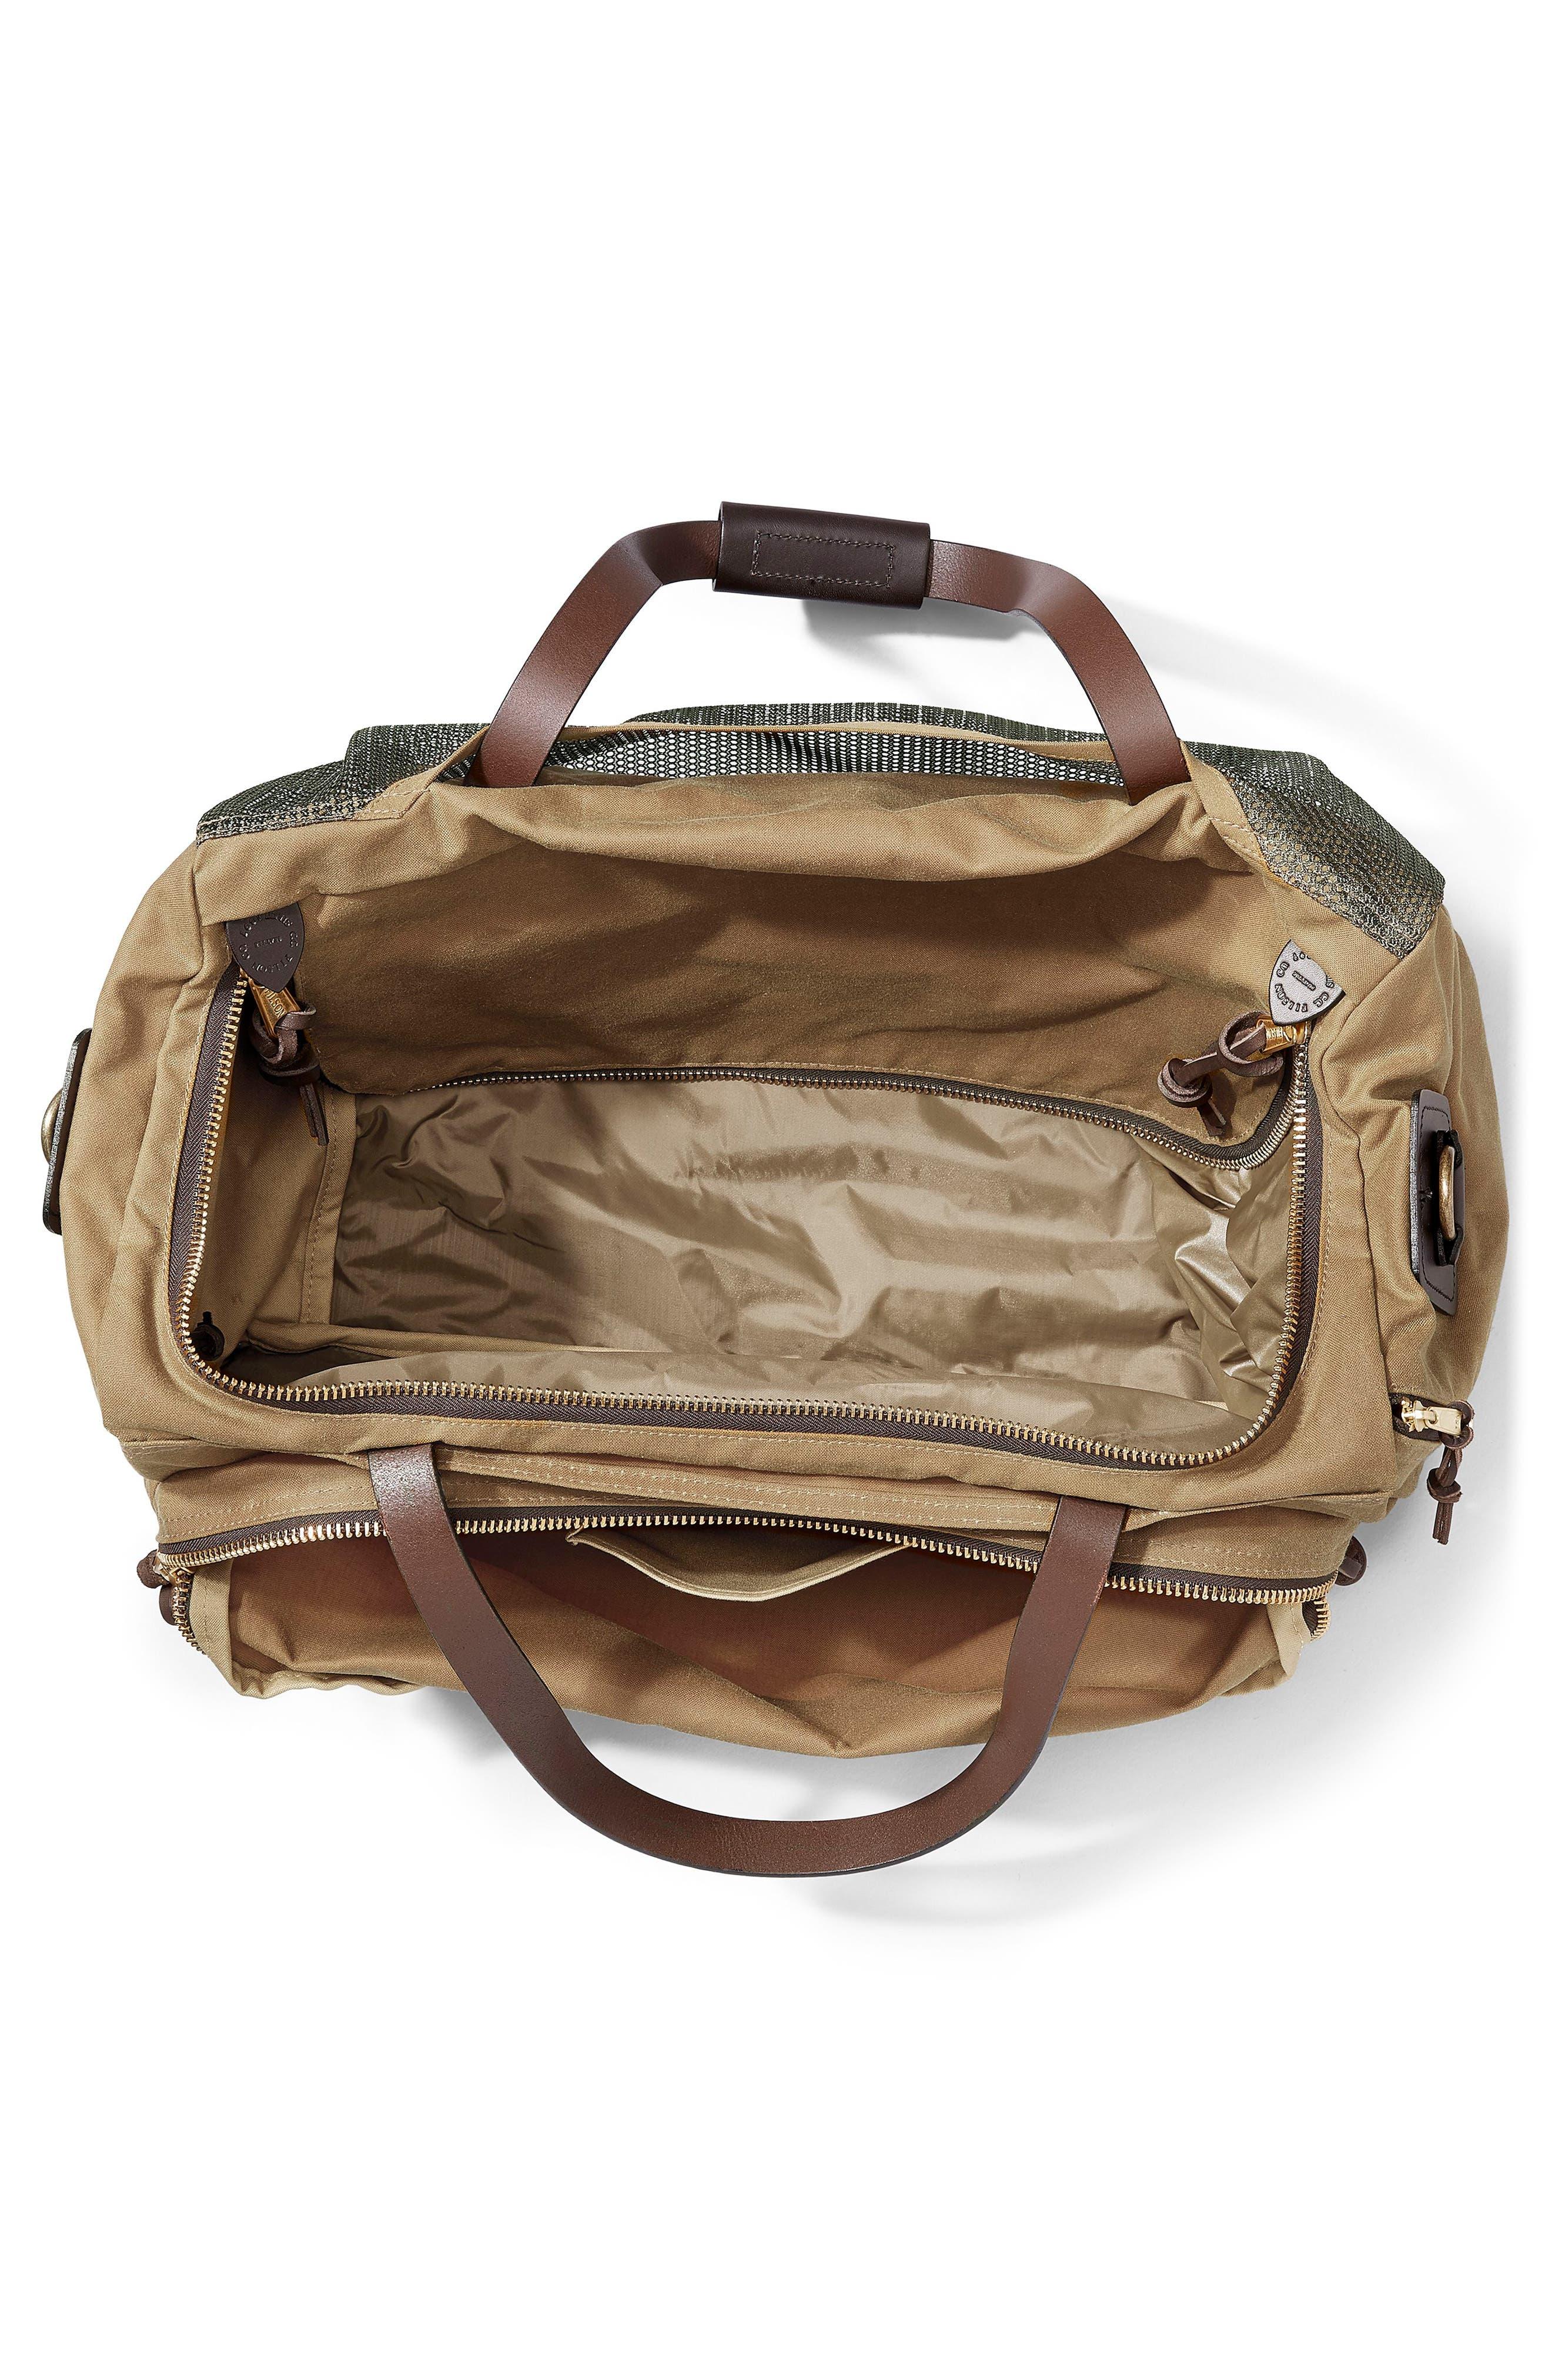 Excursion Duffel Bag,                             Alternate thumbnail 3, color,                             Tan